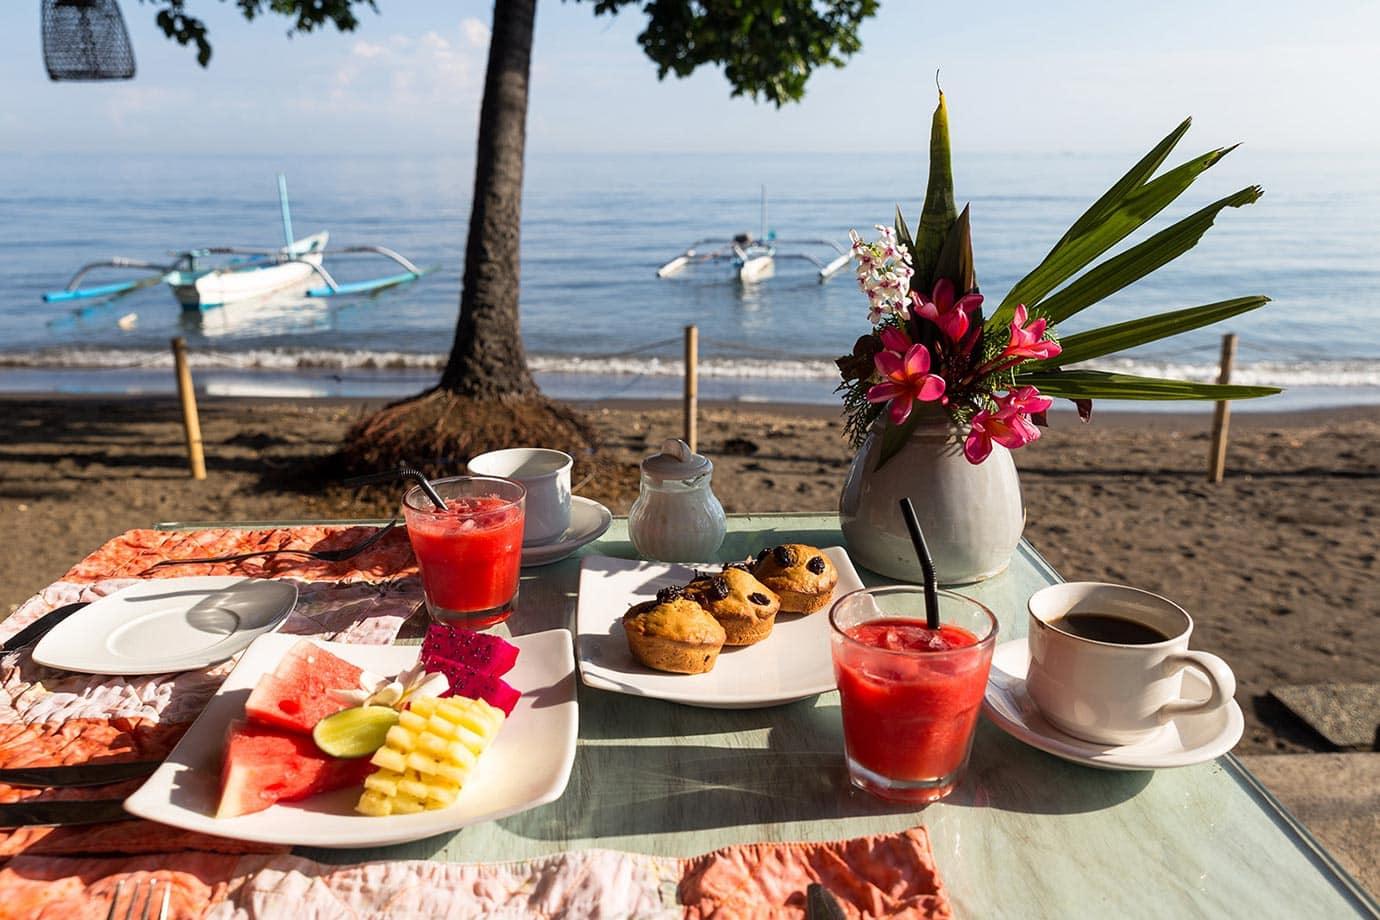 Breakfast at Lilin Lovina